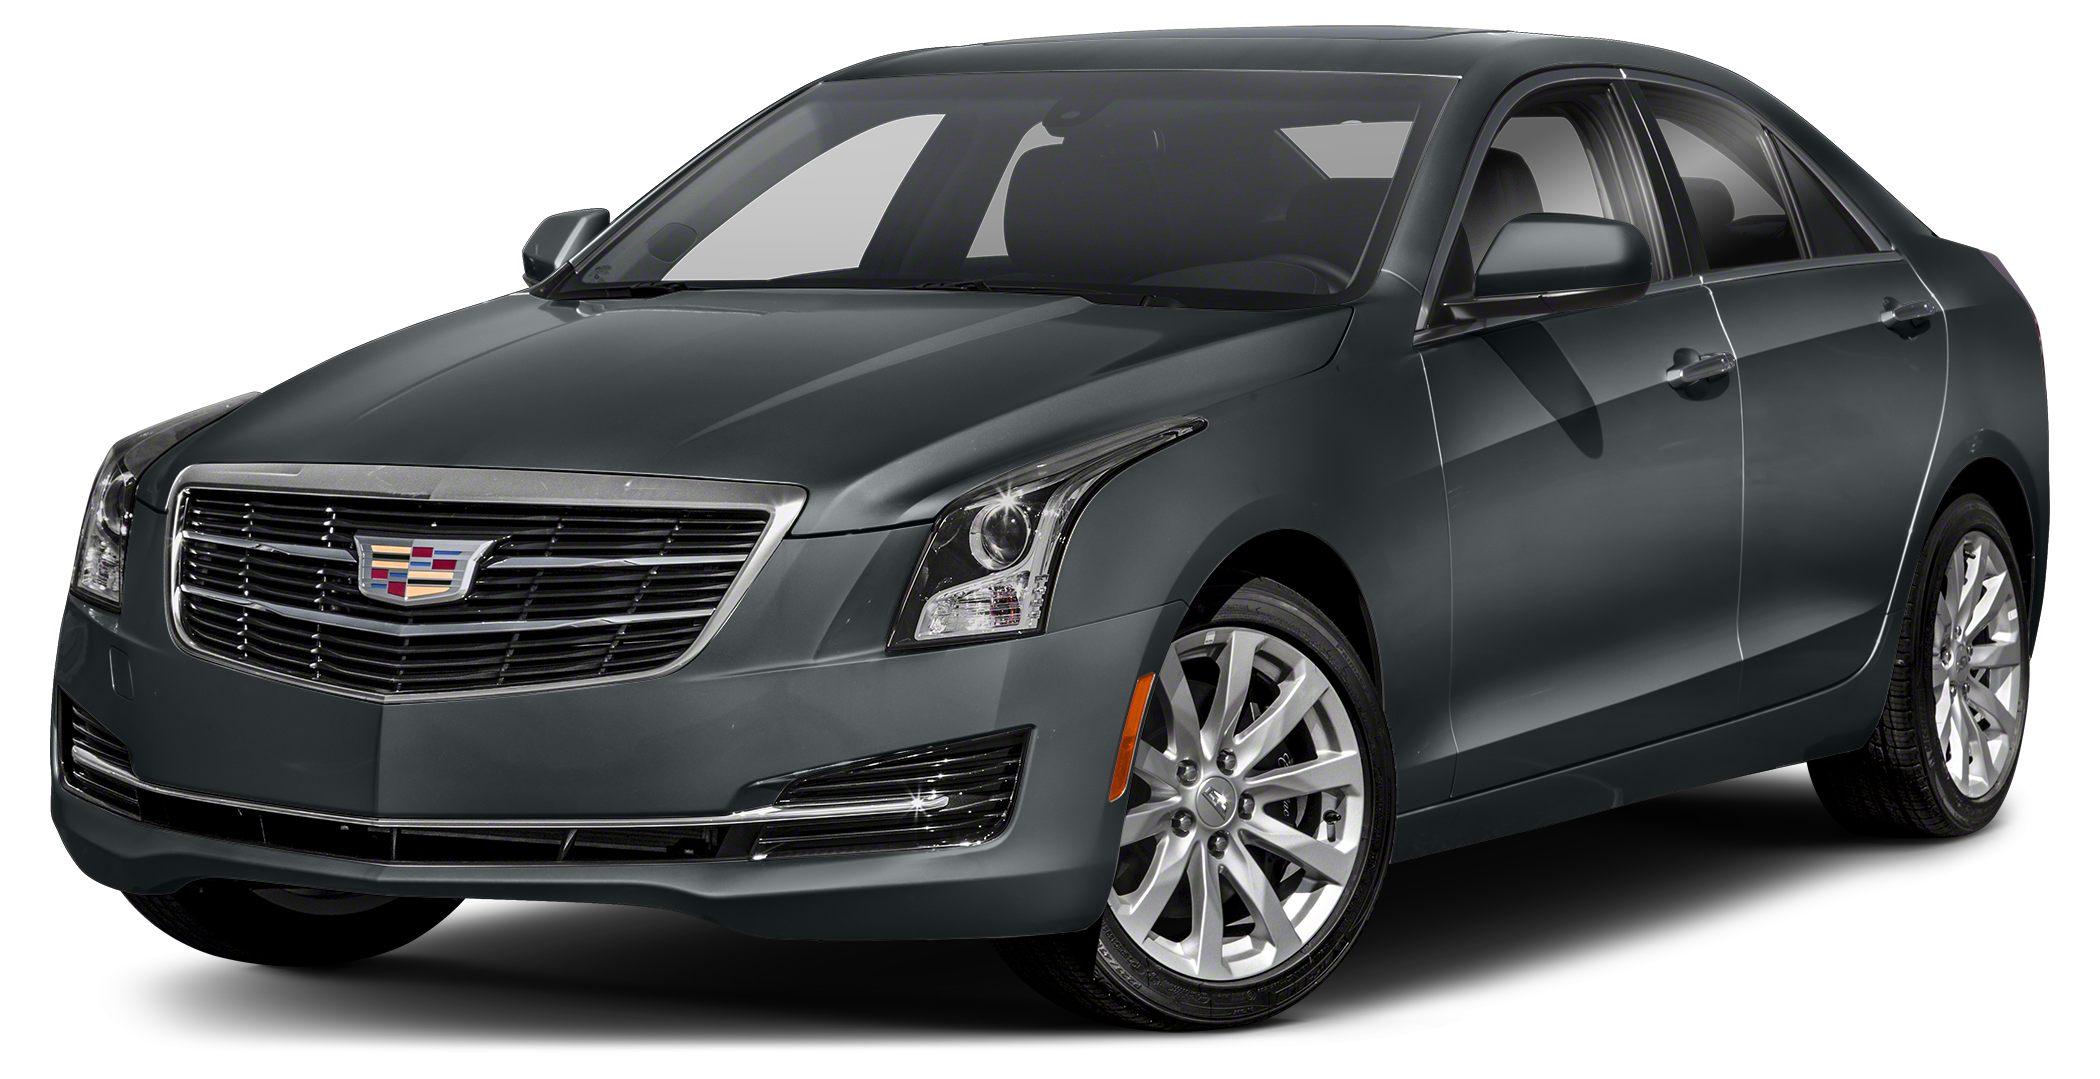 2018 Cadillac ATS 20 Turbo Prior Dealer Loaner Vehicle Phantom Gray Metallic 2018 Cadillac ATS